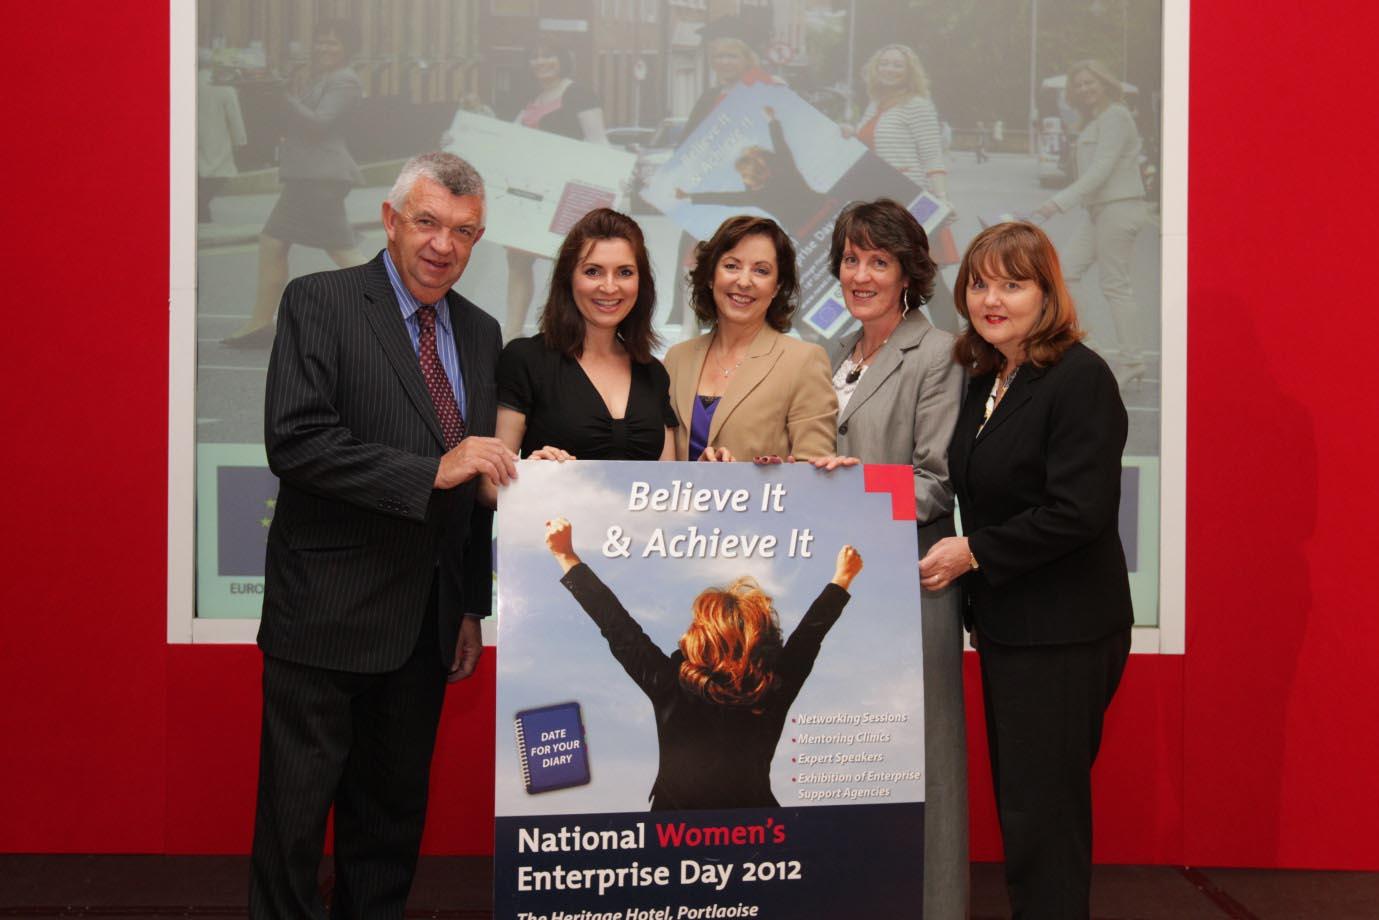 National Womens Enterprise Day Eamon Ryan,County and City Enterprise Boards (NWED organiser);TV3 presenter Colette Fitzpatrick (NWED facilitator);Orlaith Carmody ,Mediatraining.ie (NWED Speaker;Linda